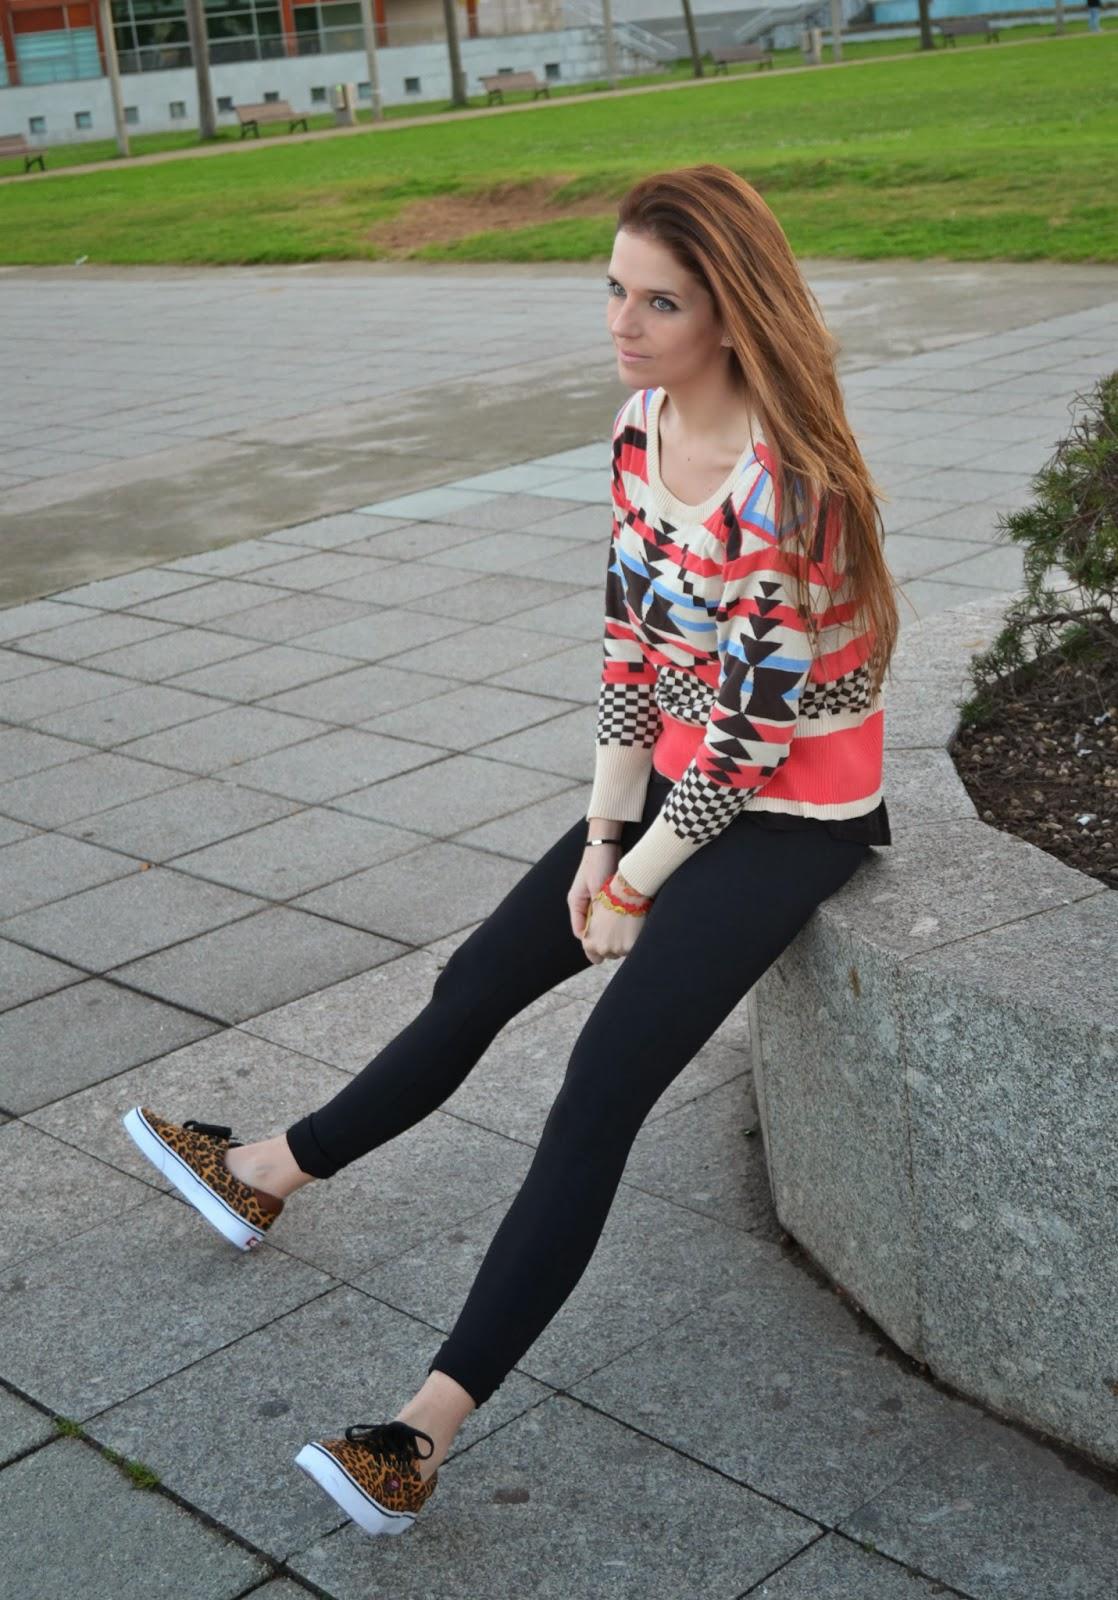 Air Max Mujer Outfit